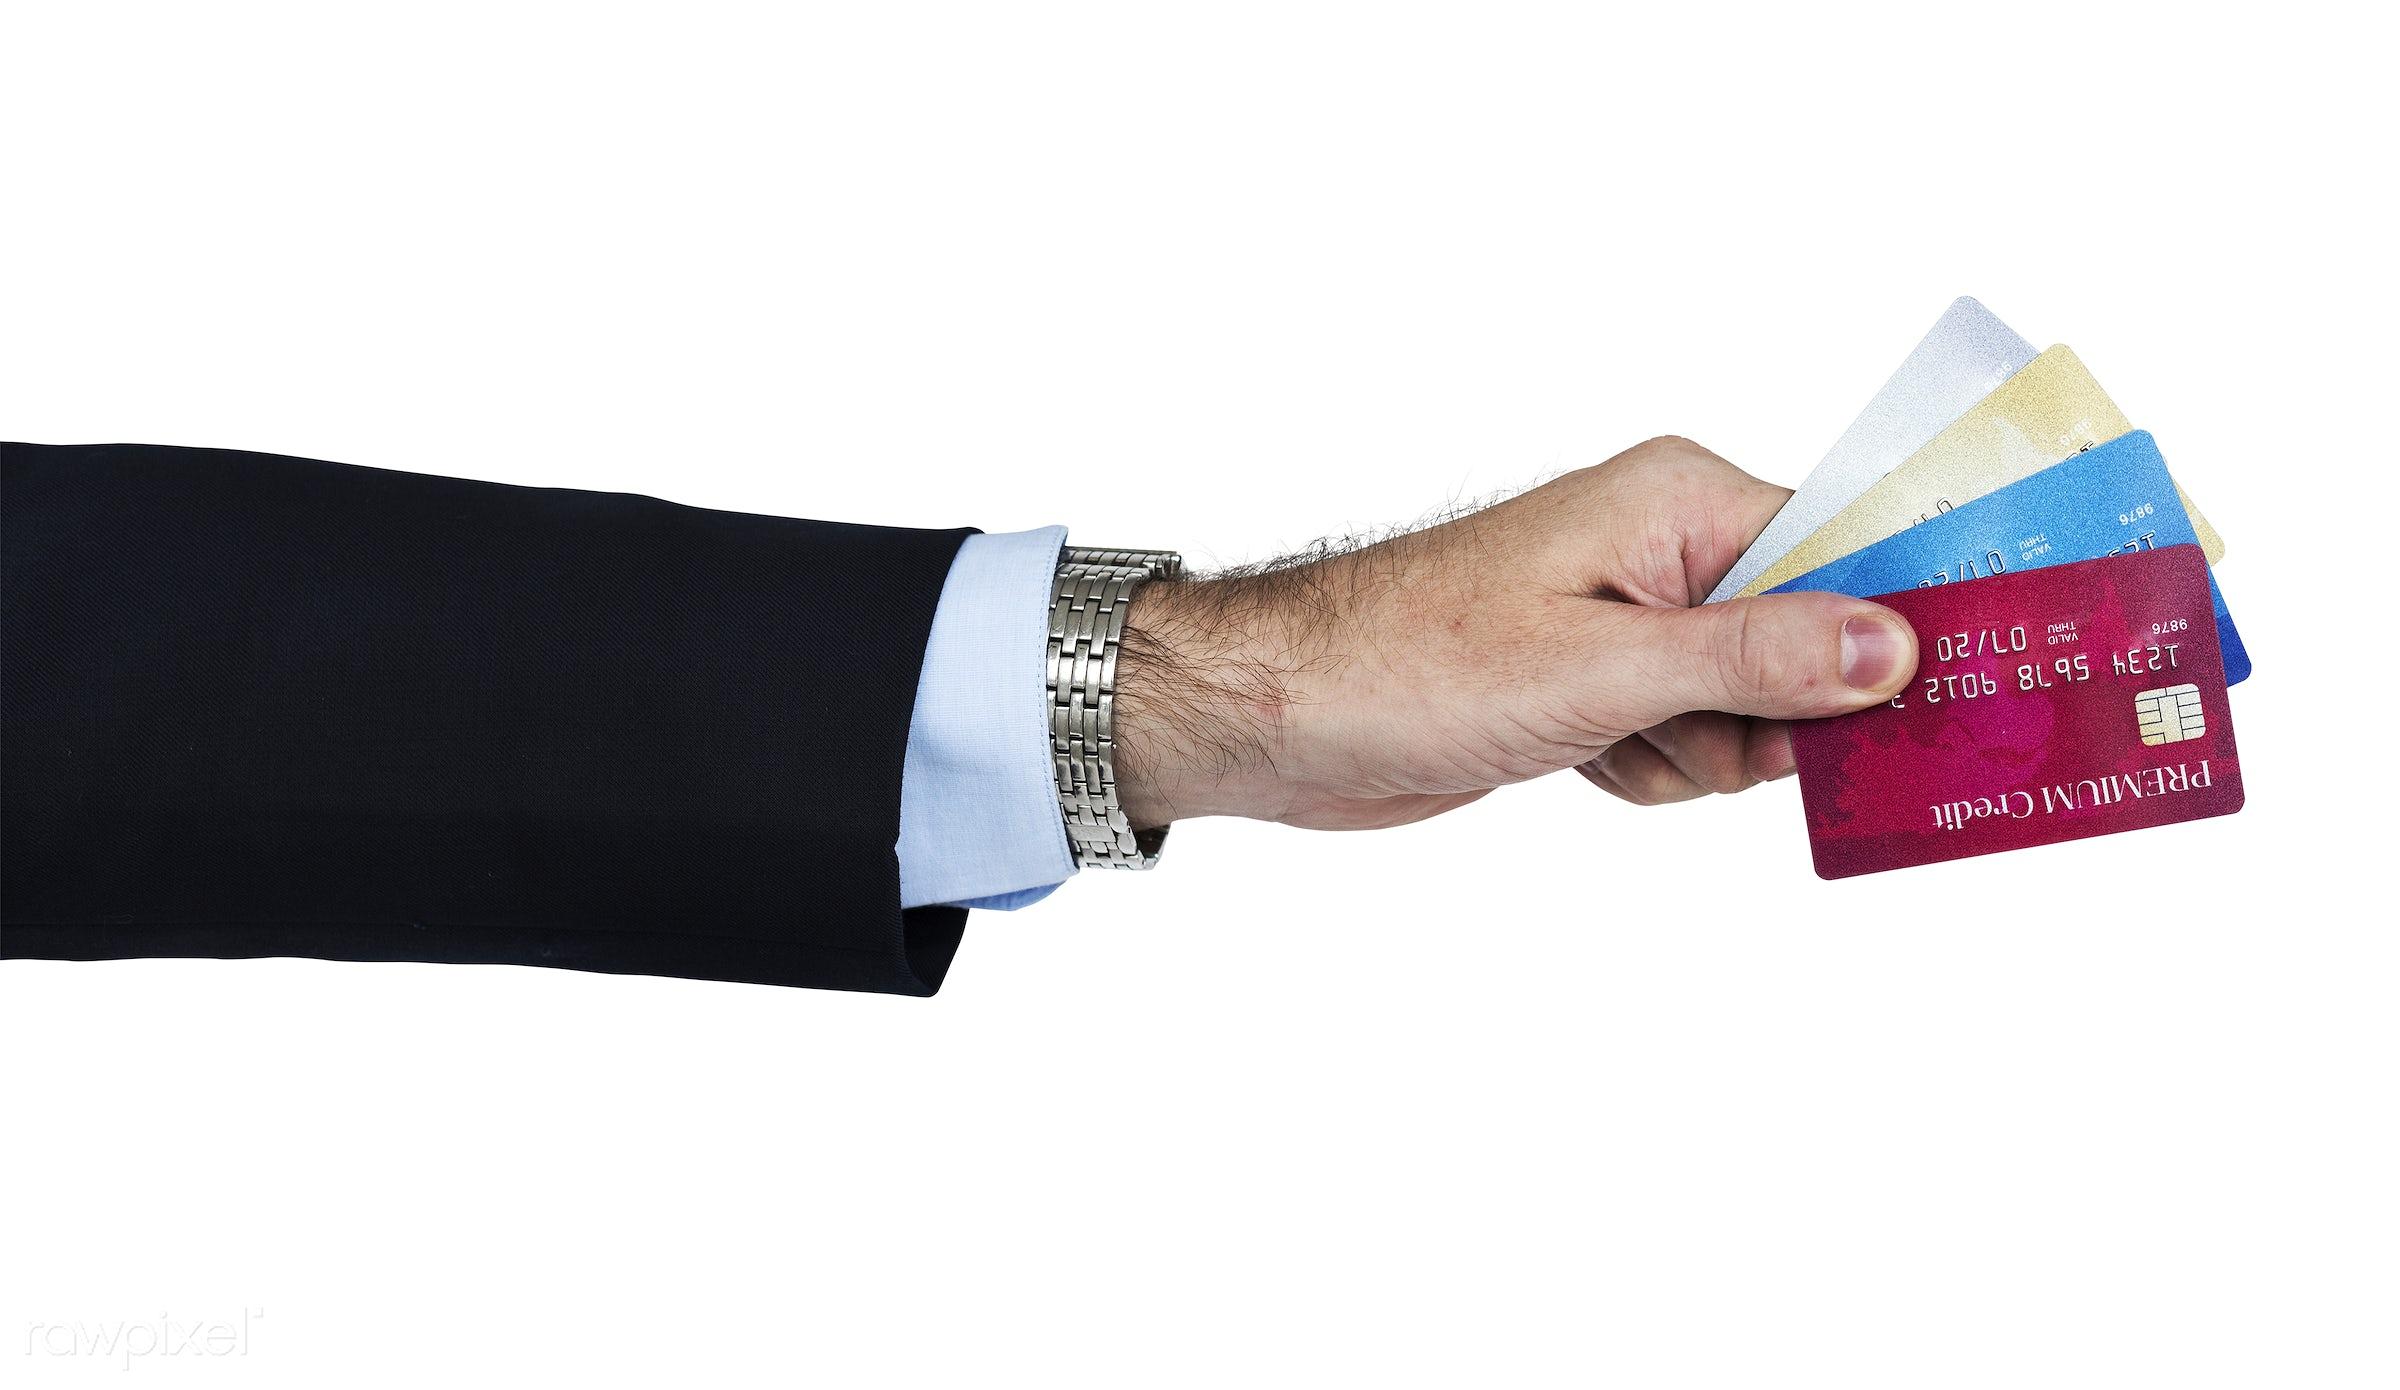 background, bill, business, business attire, business man, business wear, cards, credit, credit cards, expression, formal,...